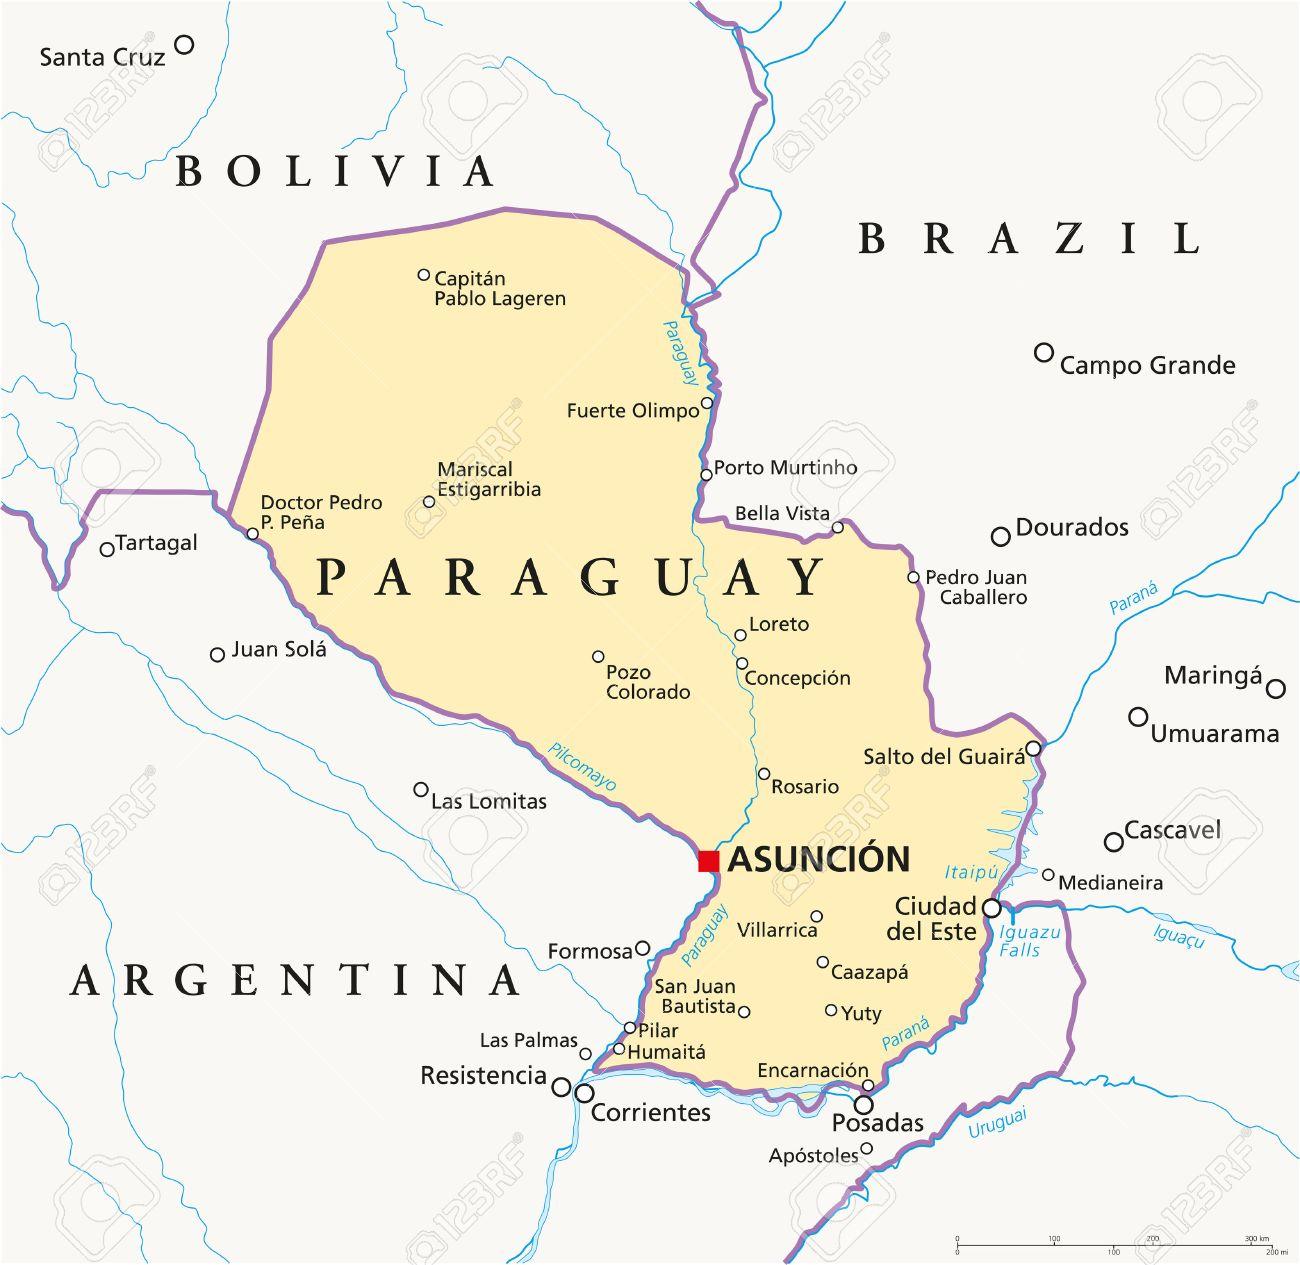 paraguay political map with capital asuncion national borders